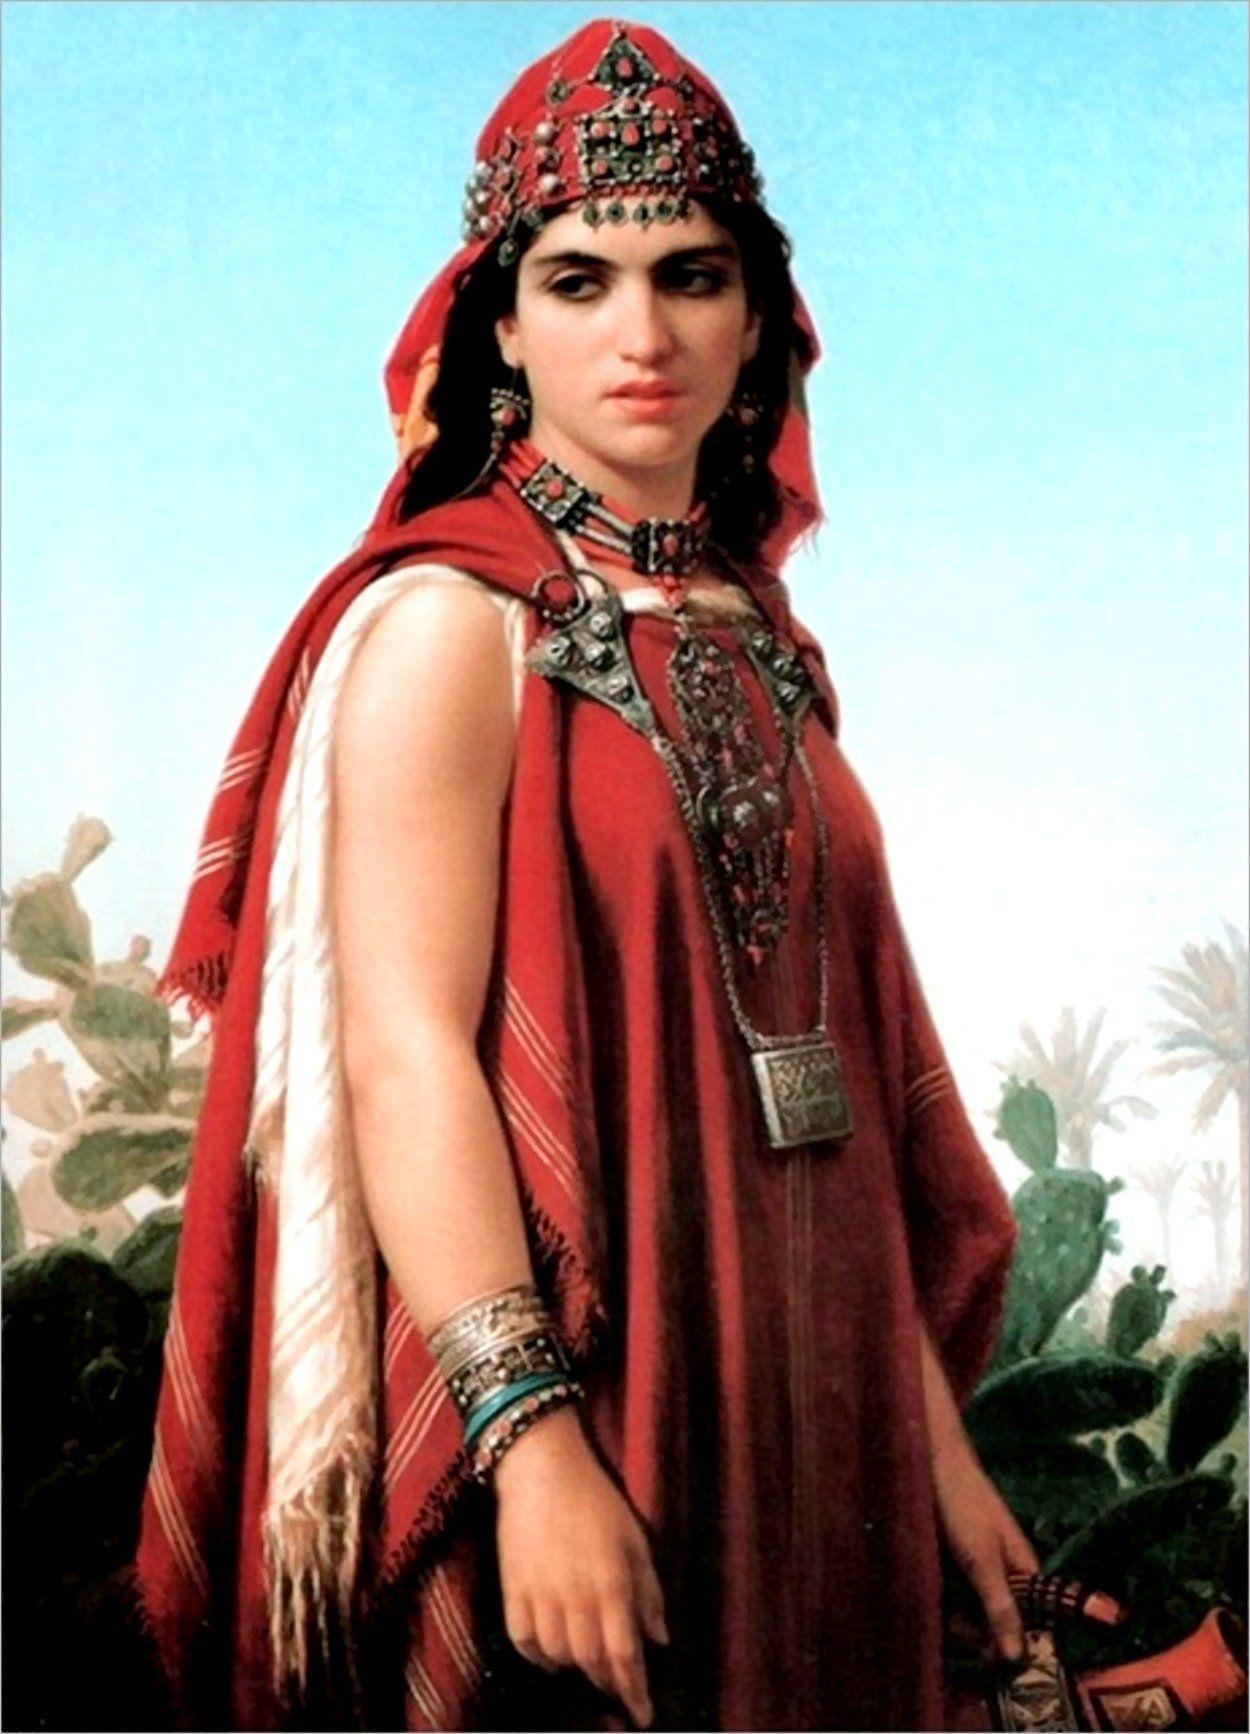 berber-woman-emile-vernet-lecomte-french-artist-1821-1900